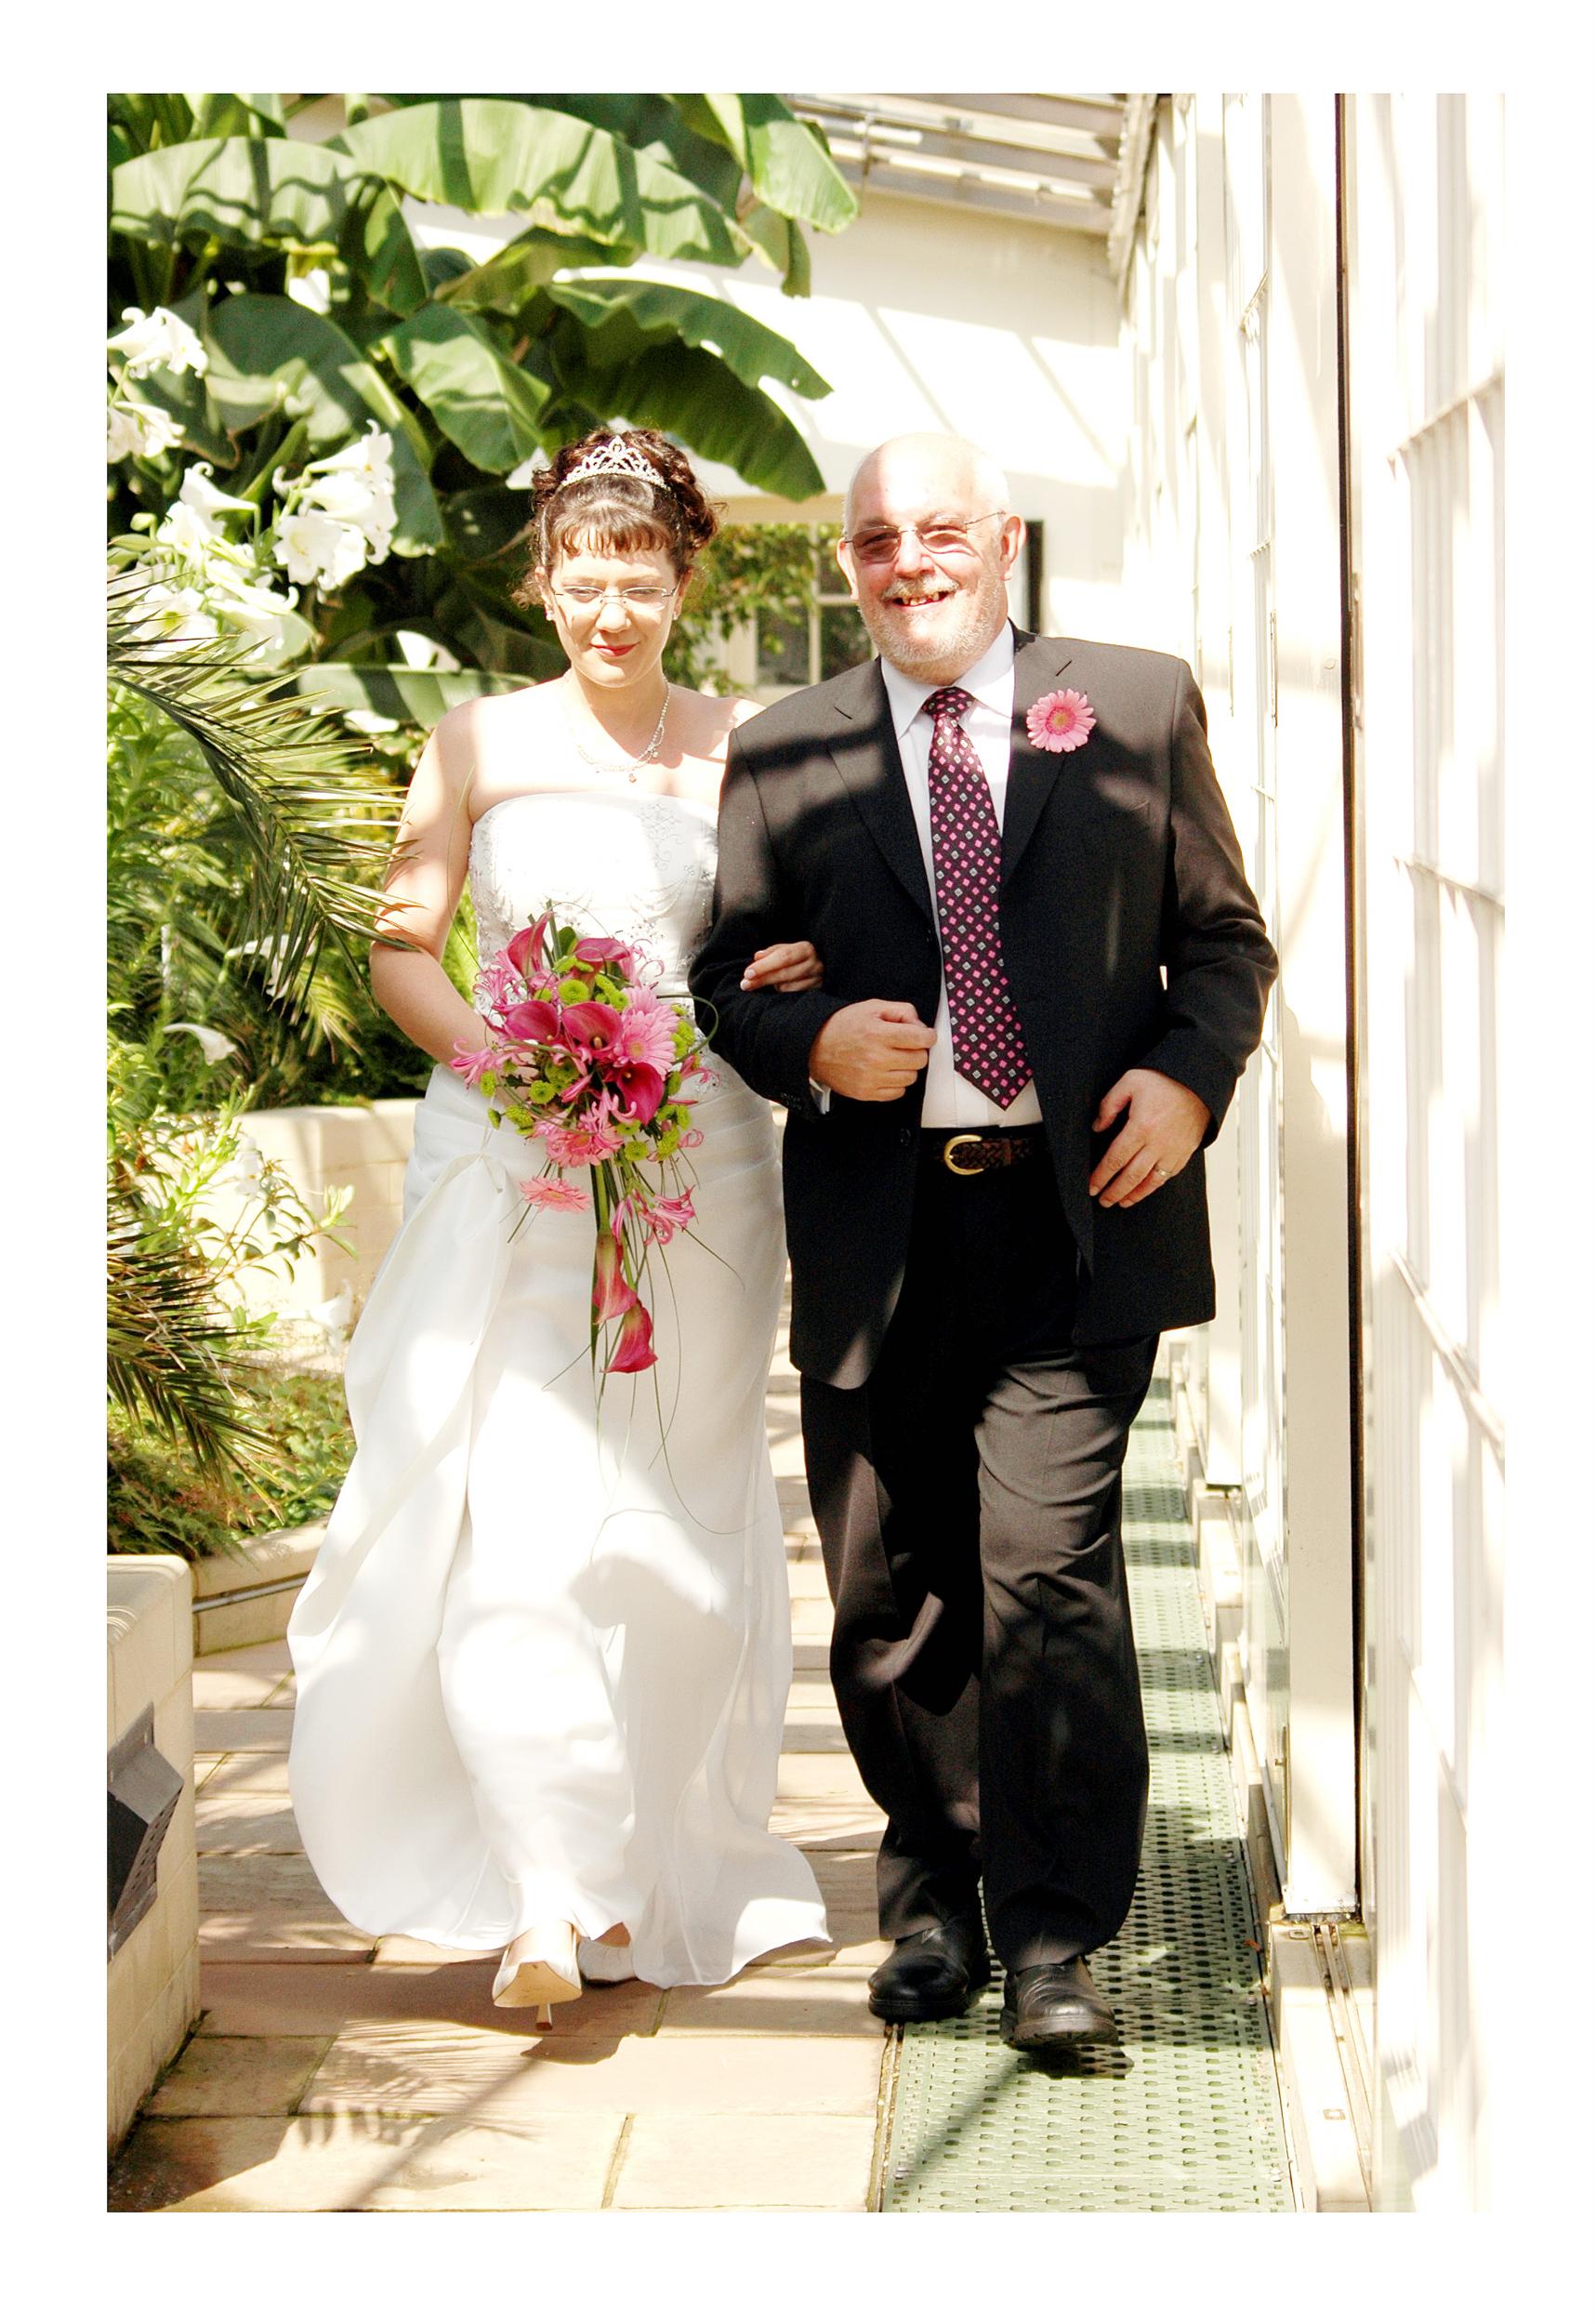 REPORTAGE-WEDDING-PHOTOGRAPHY-SET-UK-7.jpg